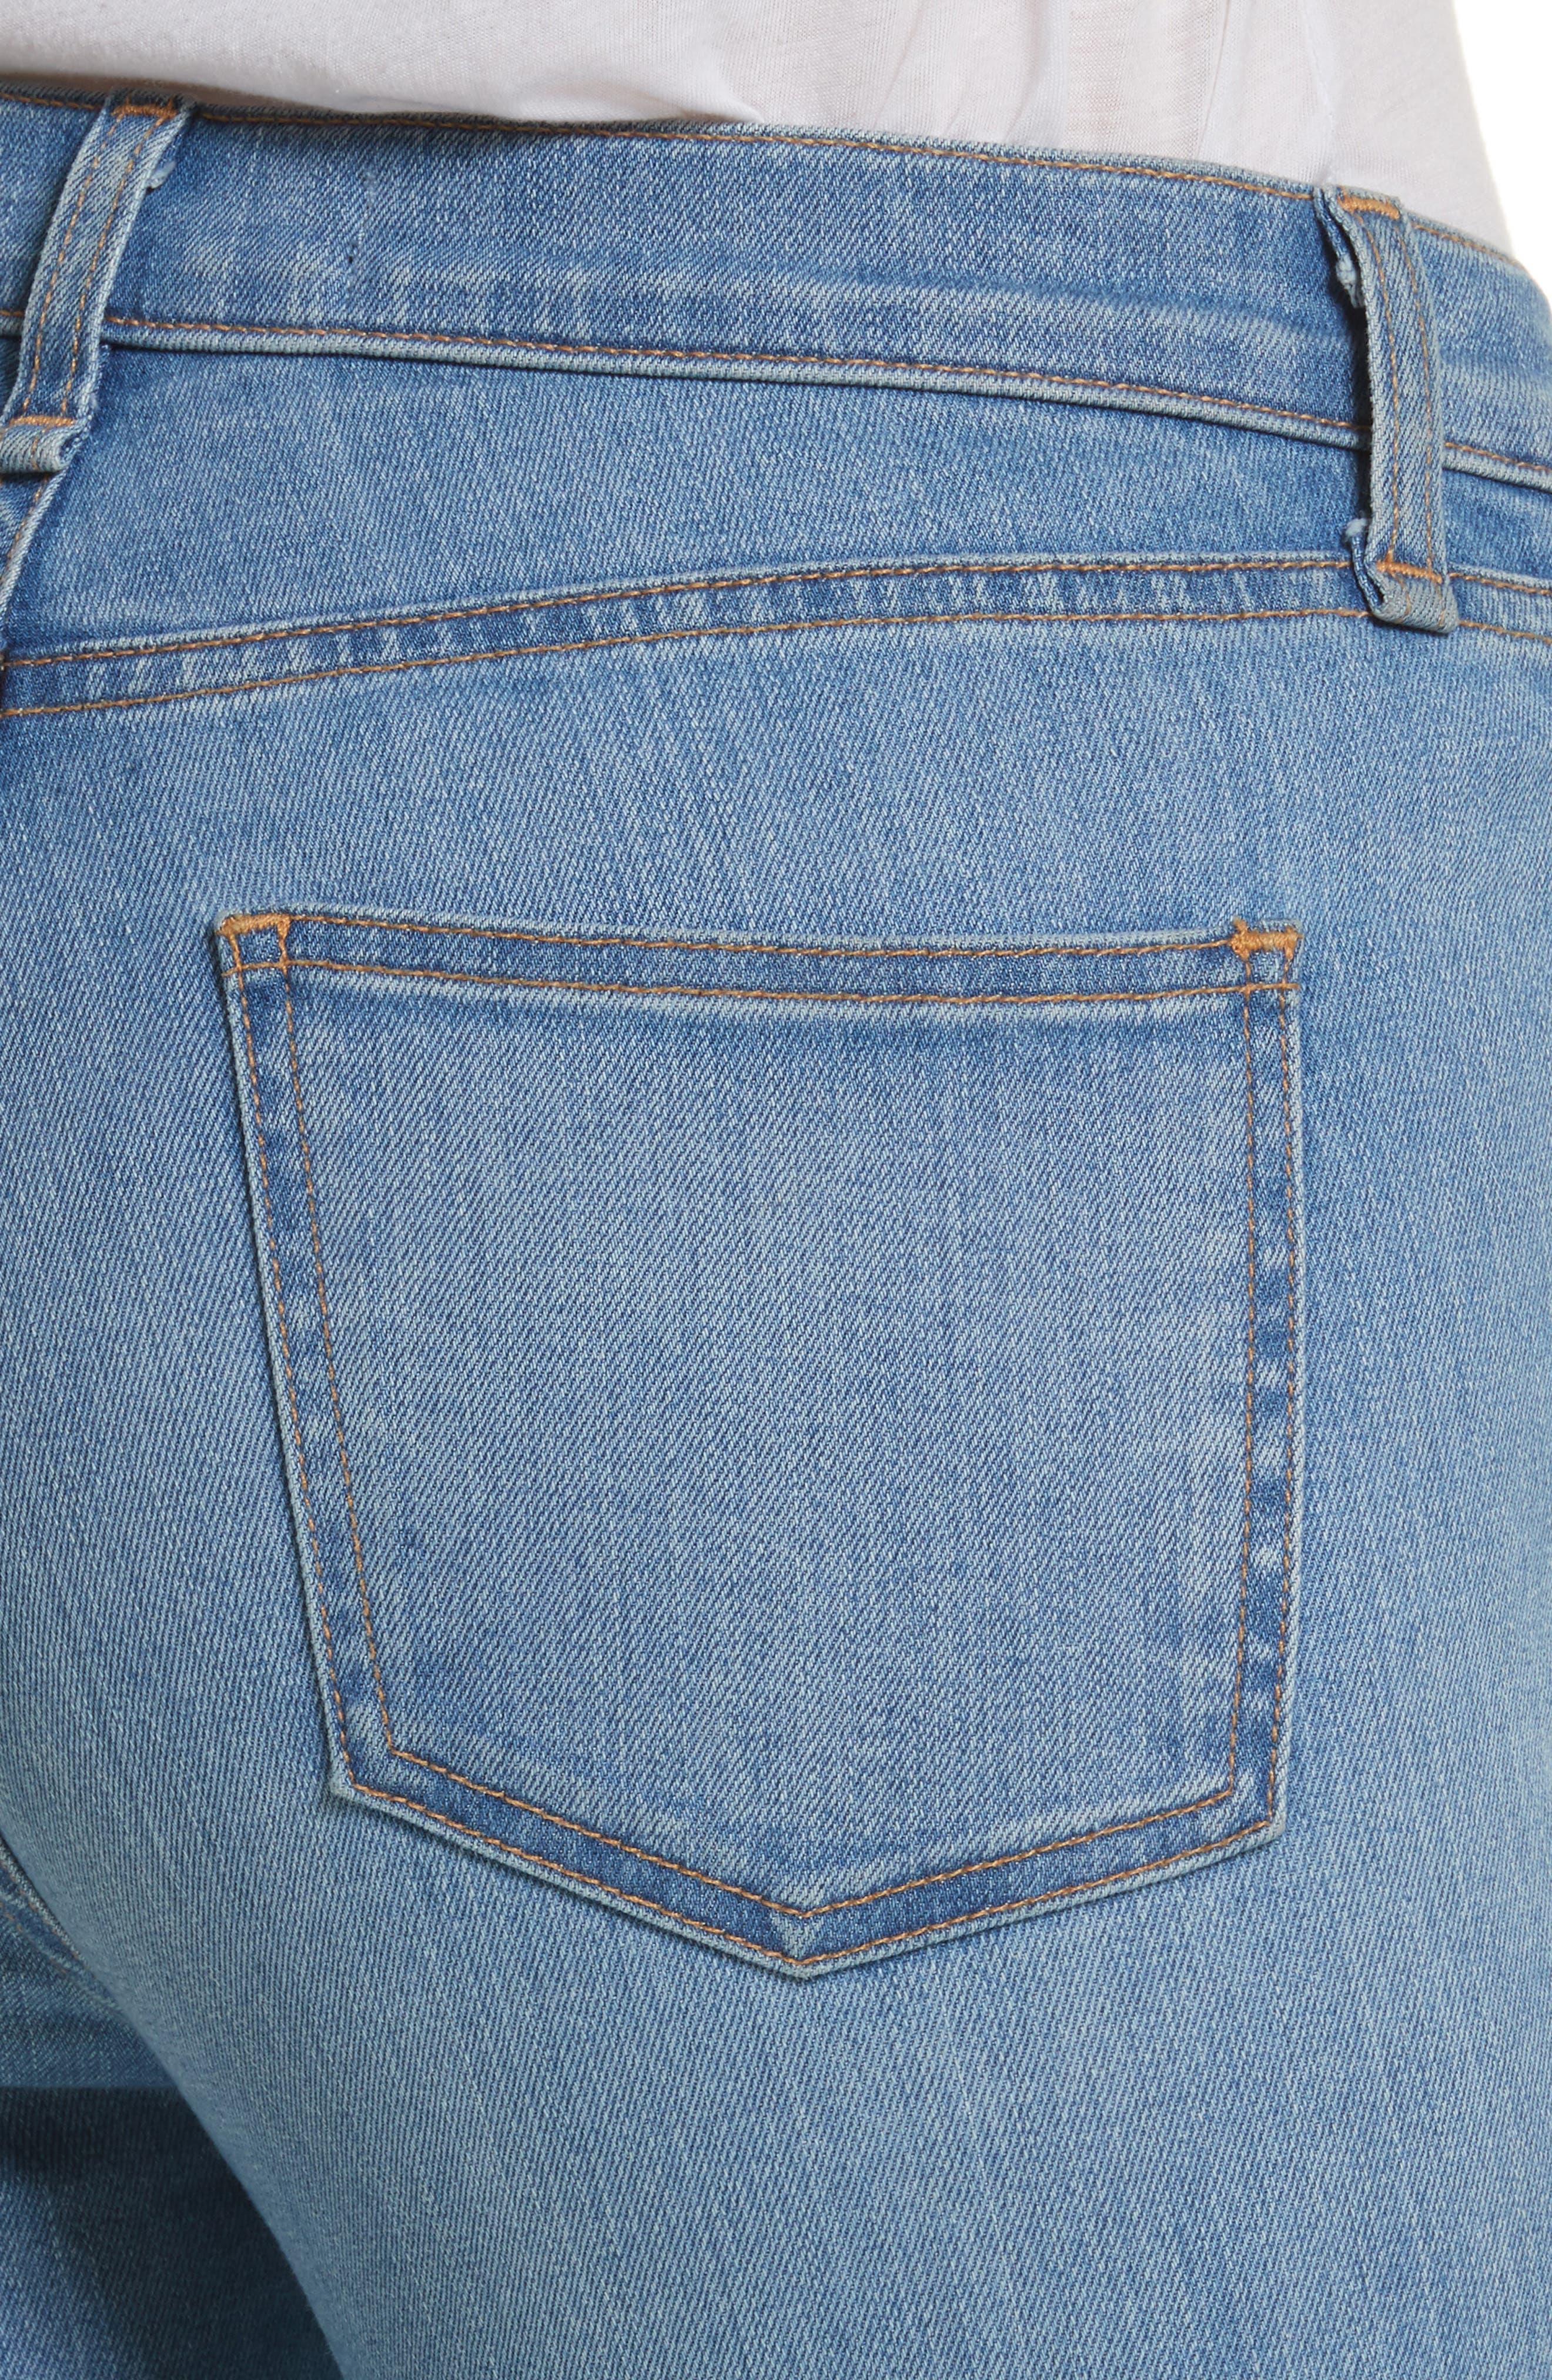 Debbie High Waist Fray Hem Jeans,                             Alternate thumbnail 4, color,                             Retro Blue